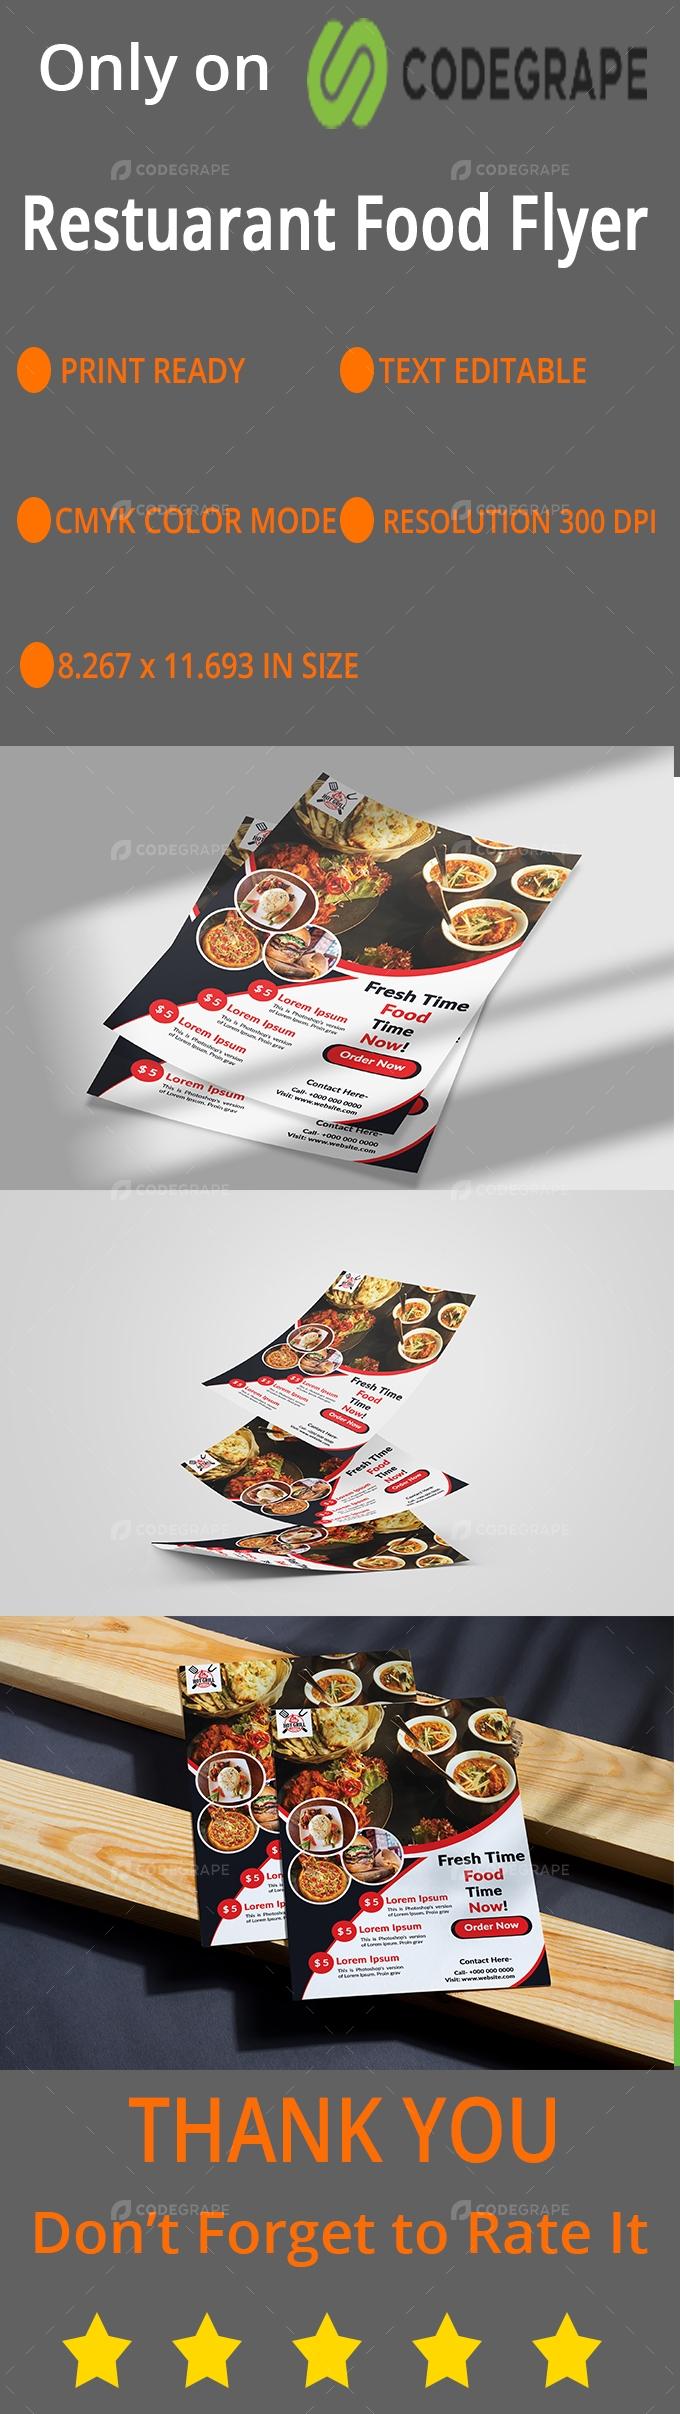 Creative Restaurant Flyer Template